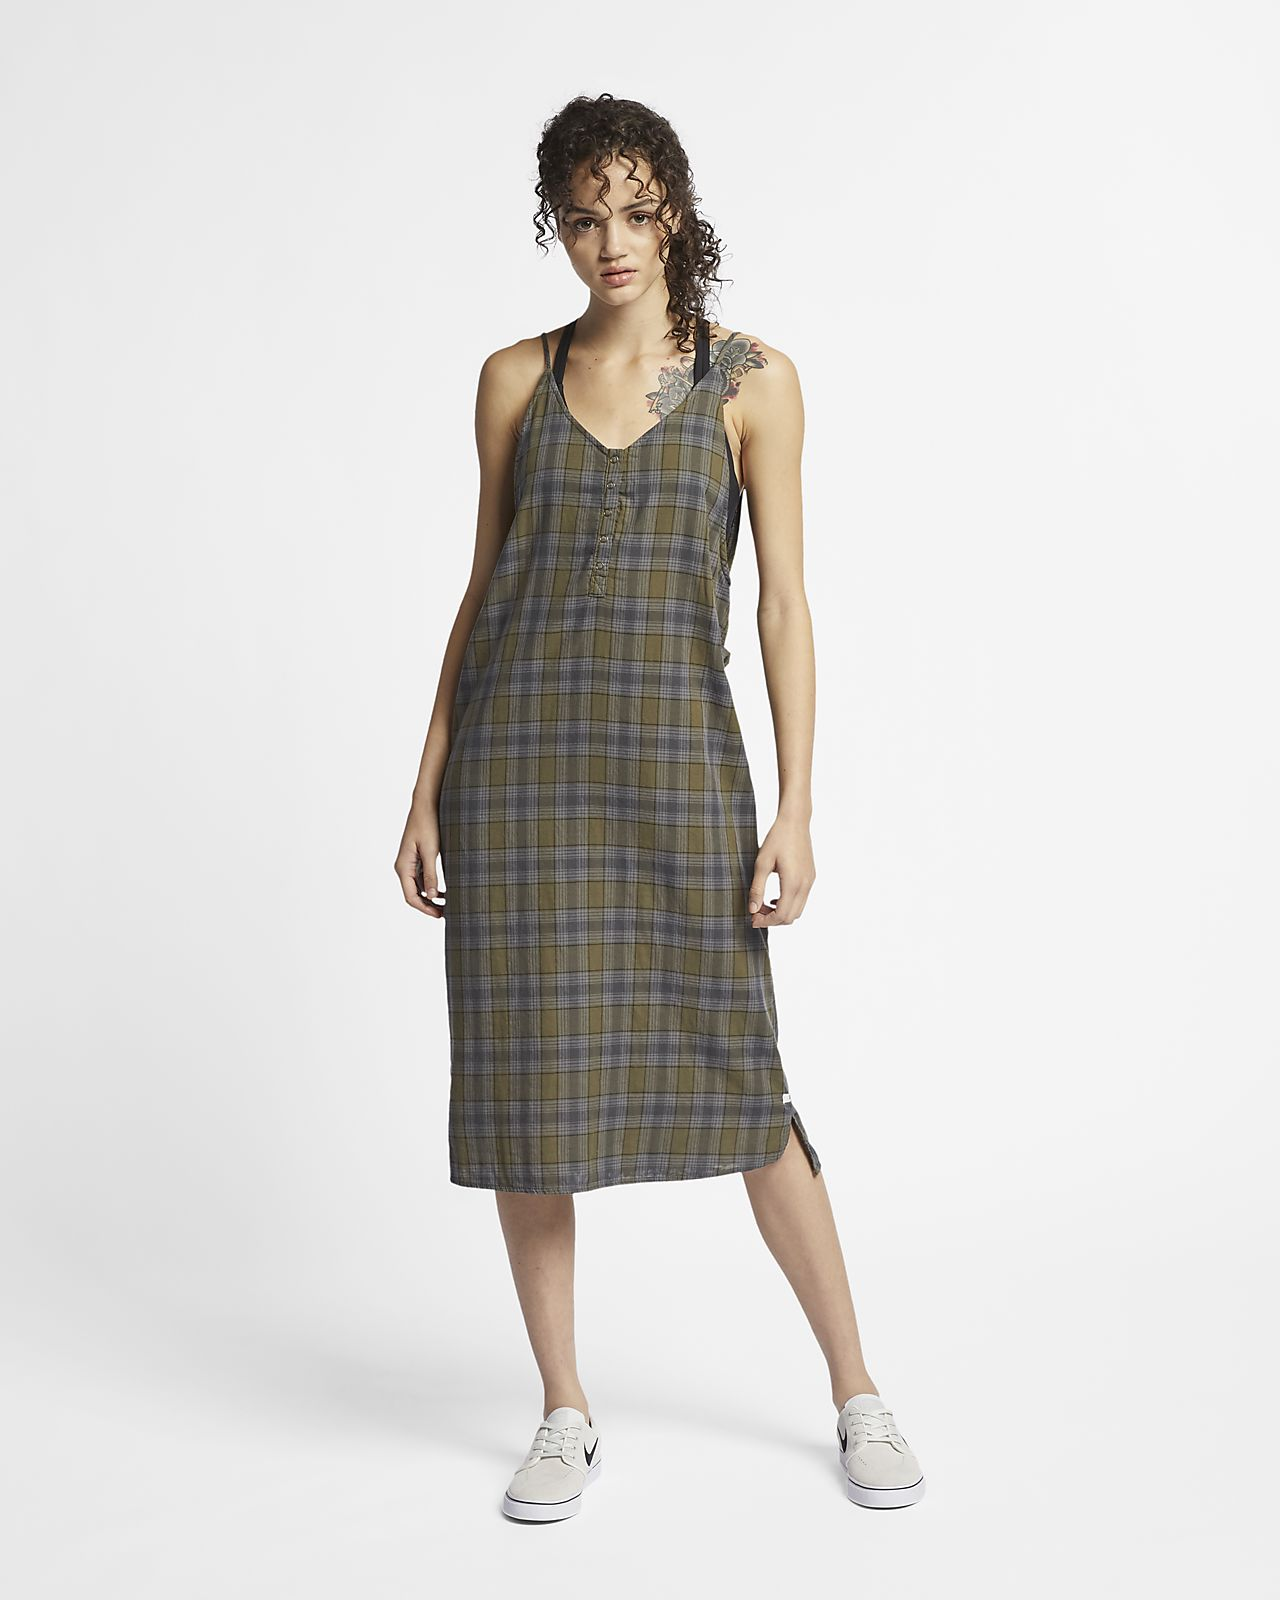 Hurley Tank Women's Check Maxi Dress